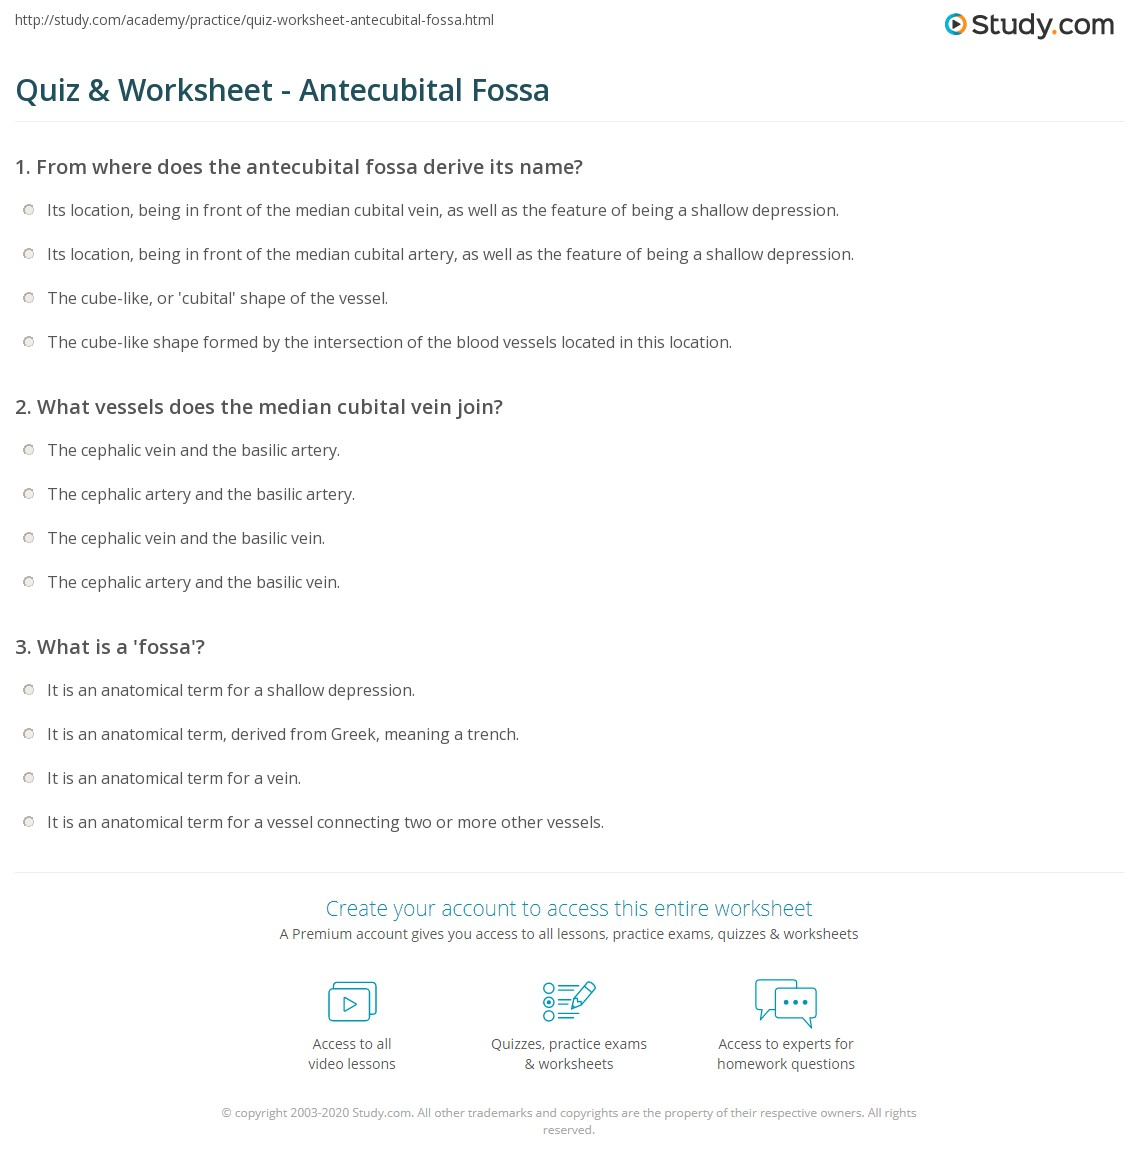 Quiz & Worksheet - Antecubital Fossa | Study.com